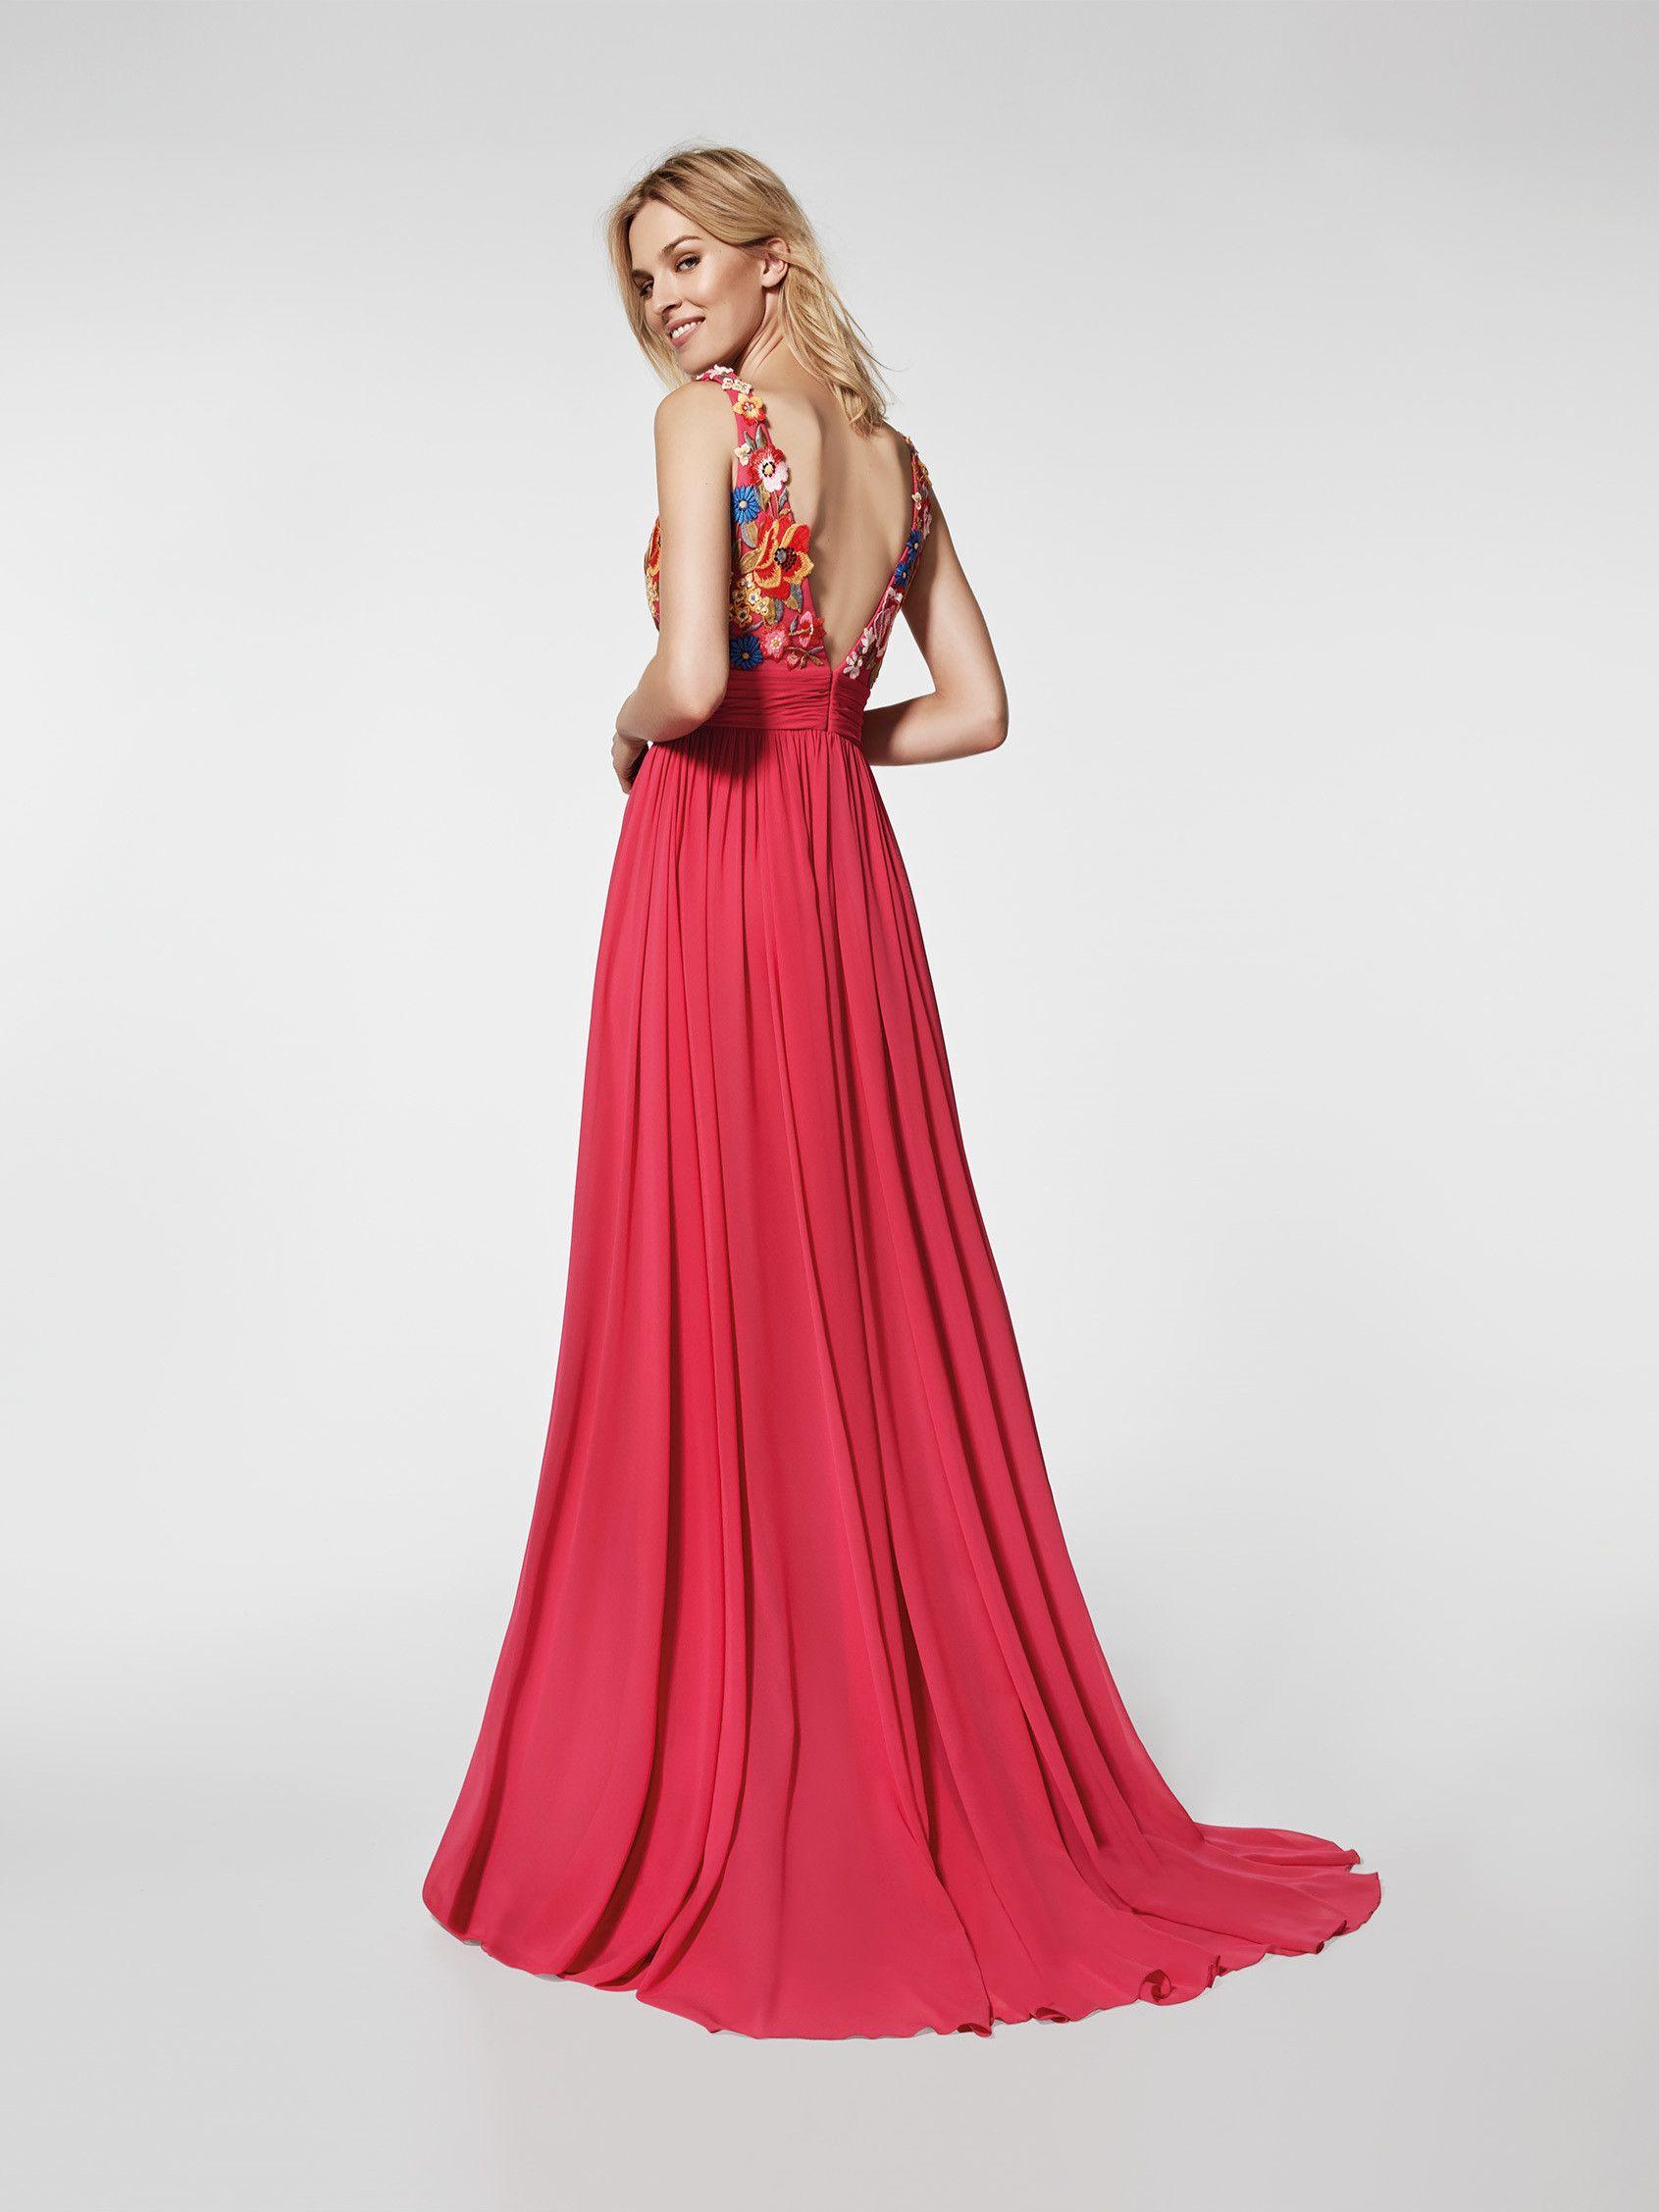 5ede37b8477b Vestido de fiesta rojo - Vestido largo GRETEL - con tirantes ...